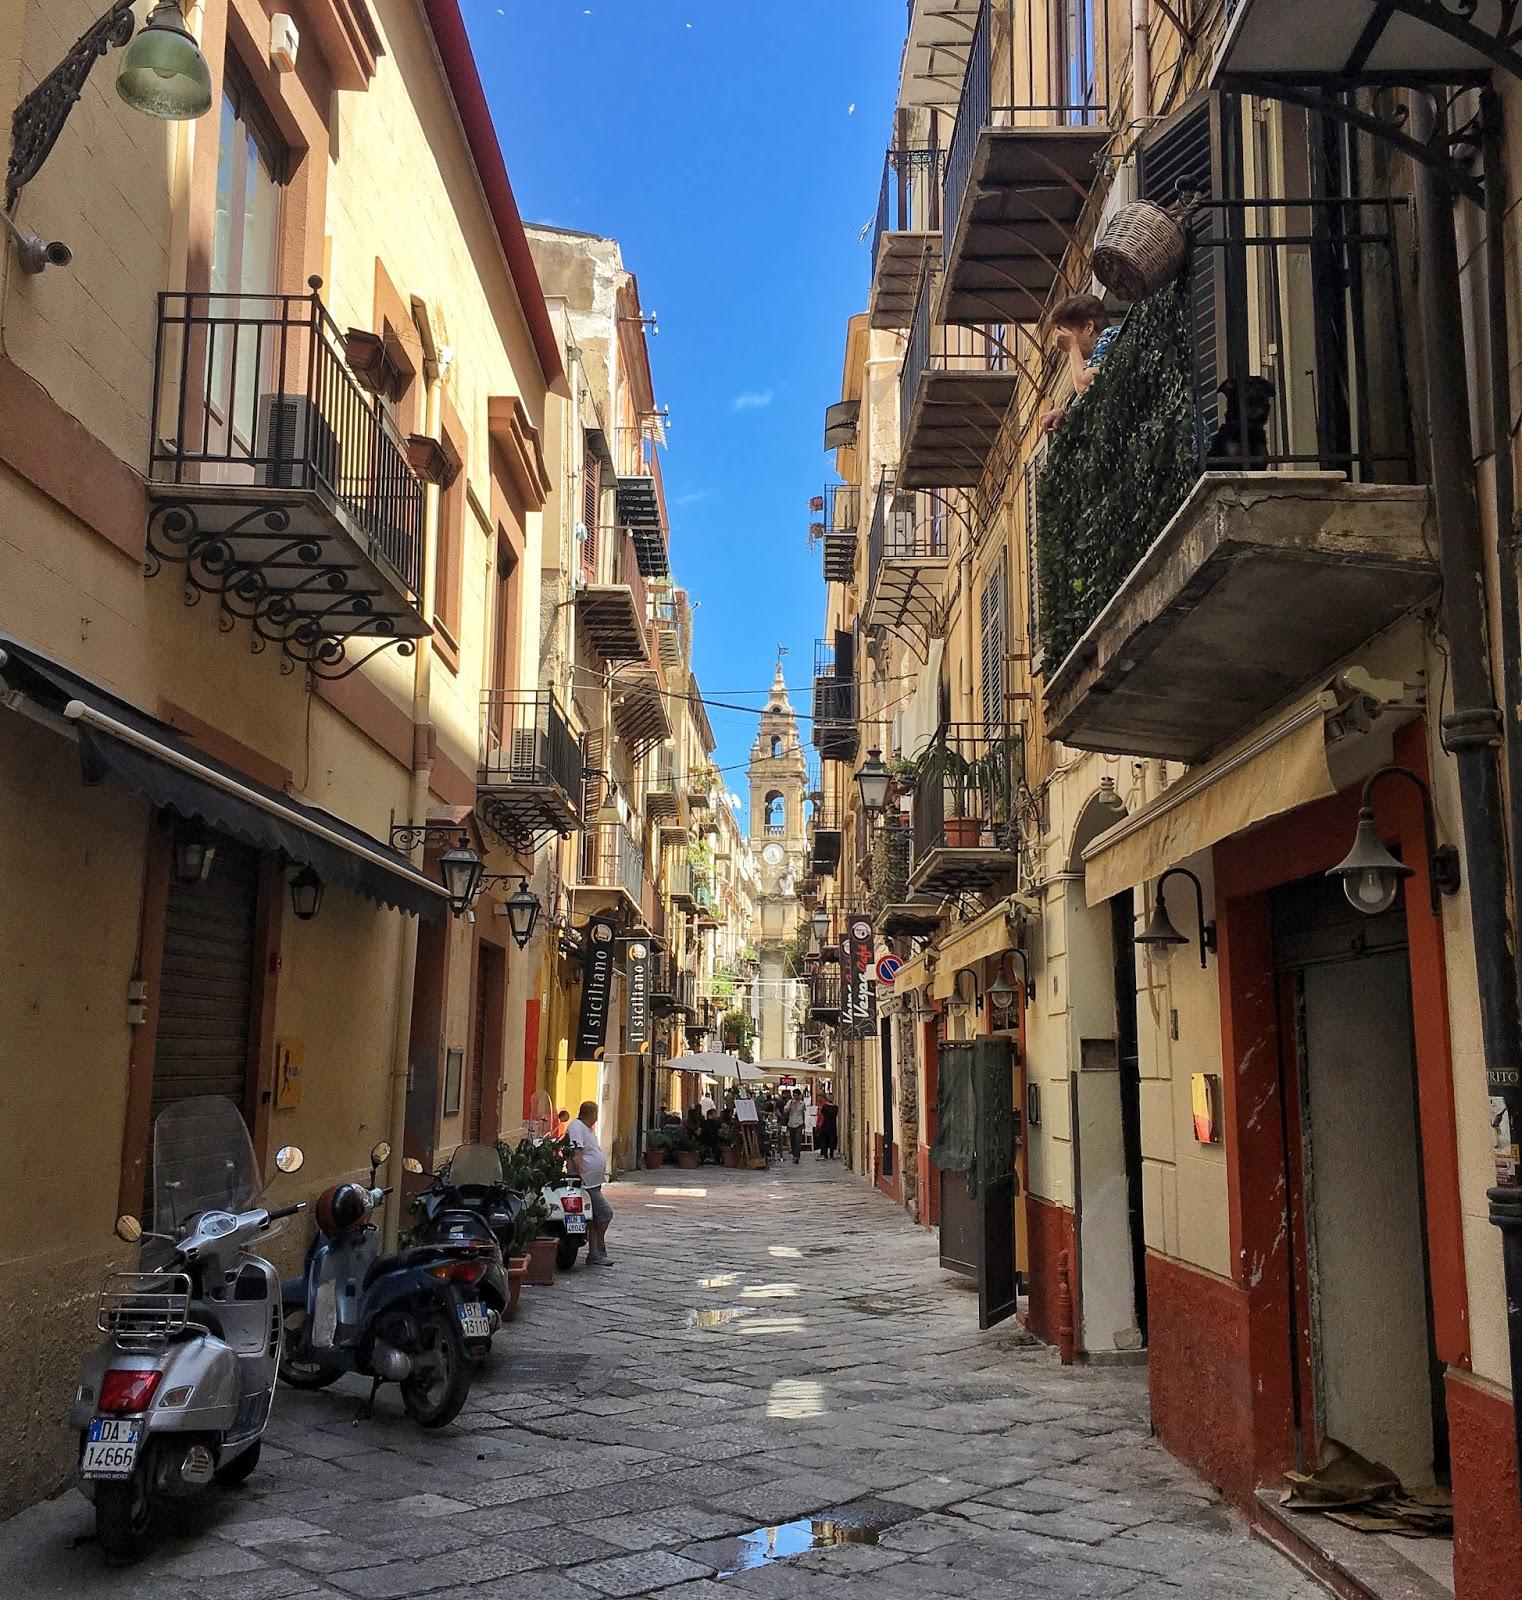 Italy, Palermo, Sicily